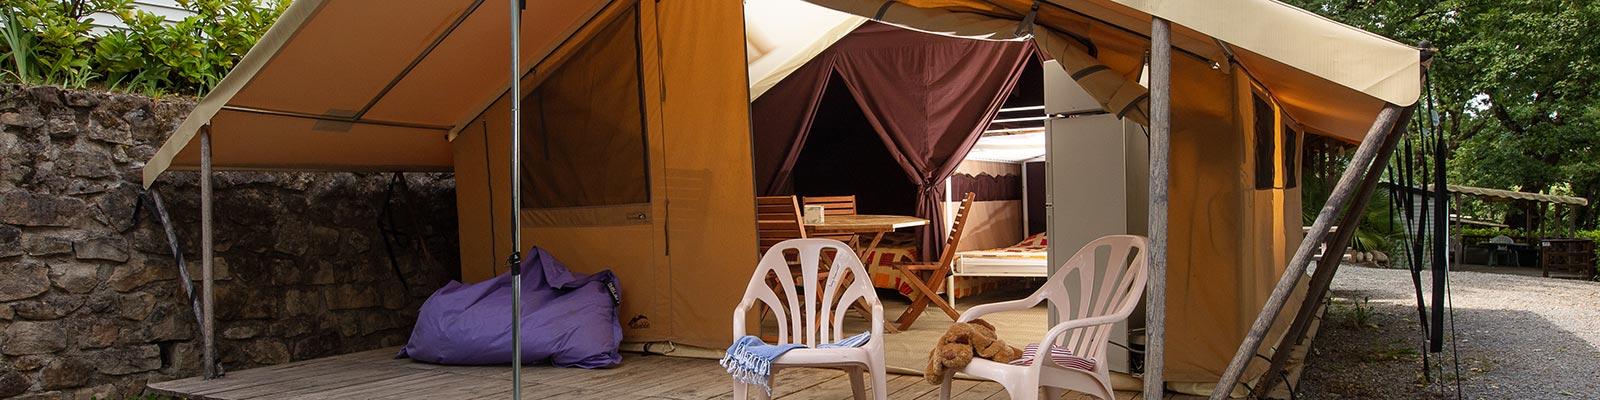 louer tente Ardèche